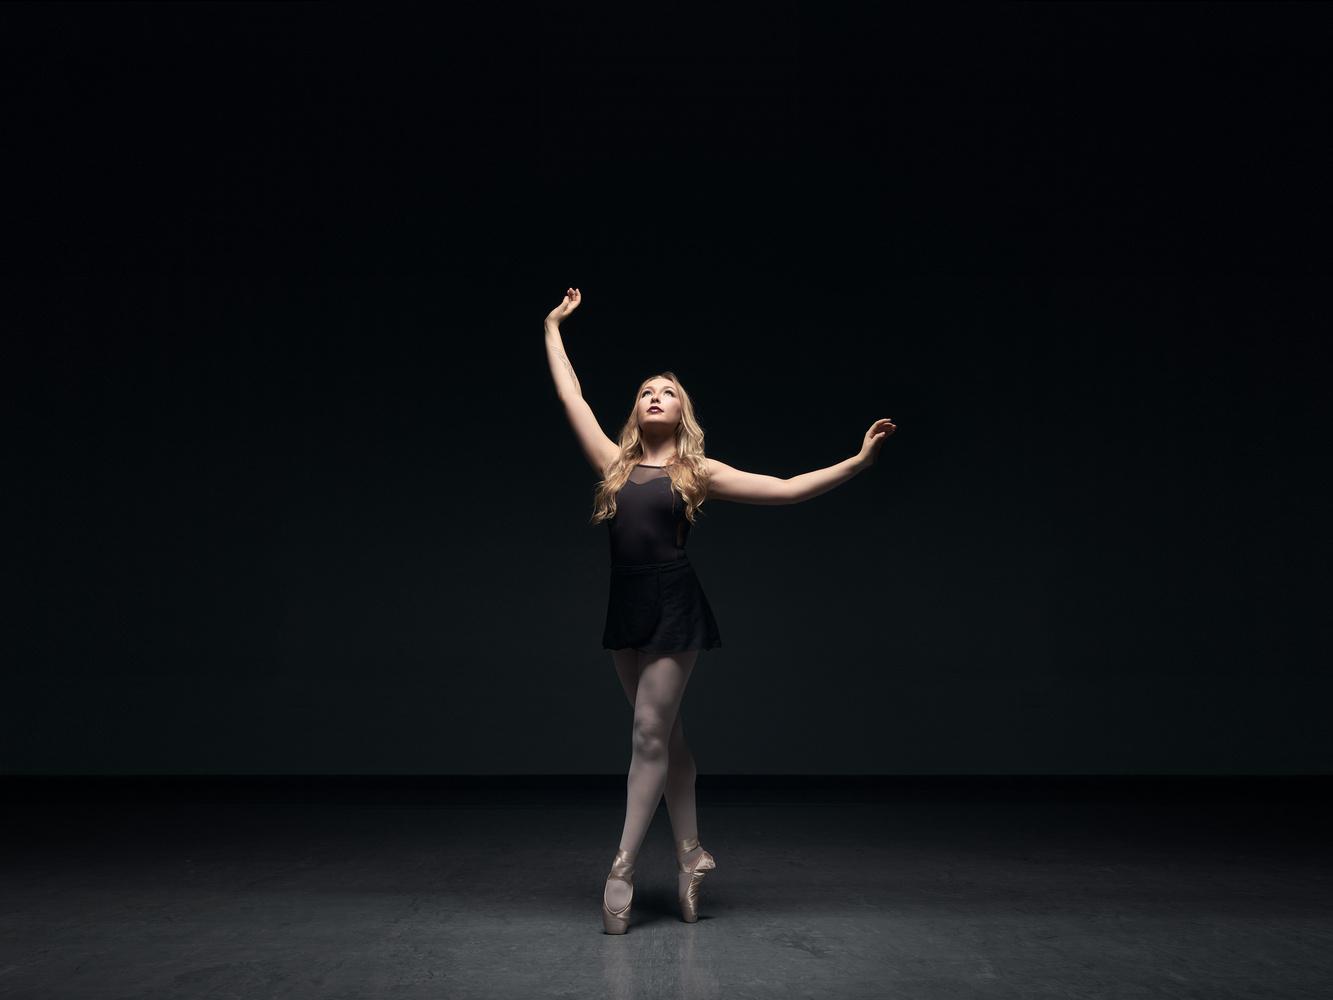 Allison the Dancer by Michael Porterfield